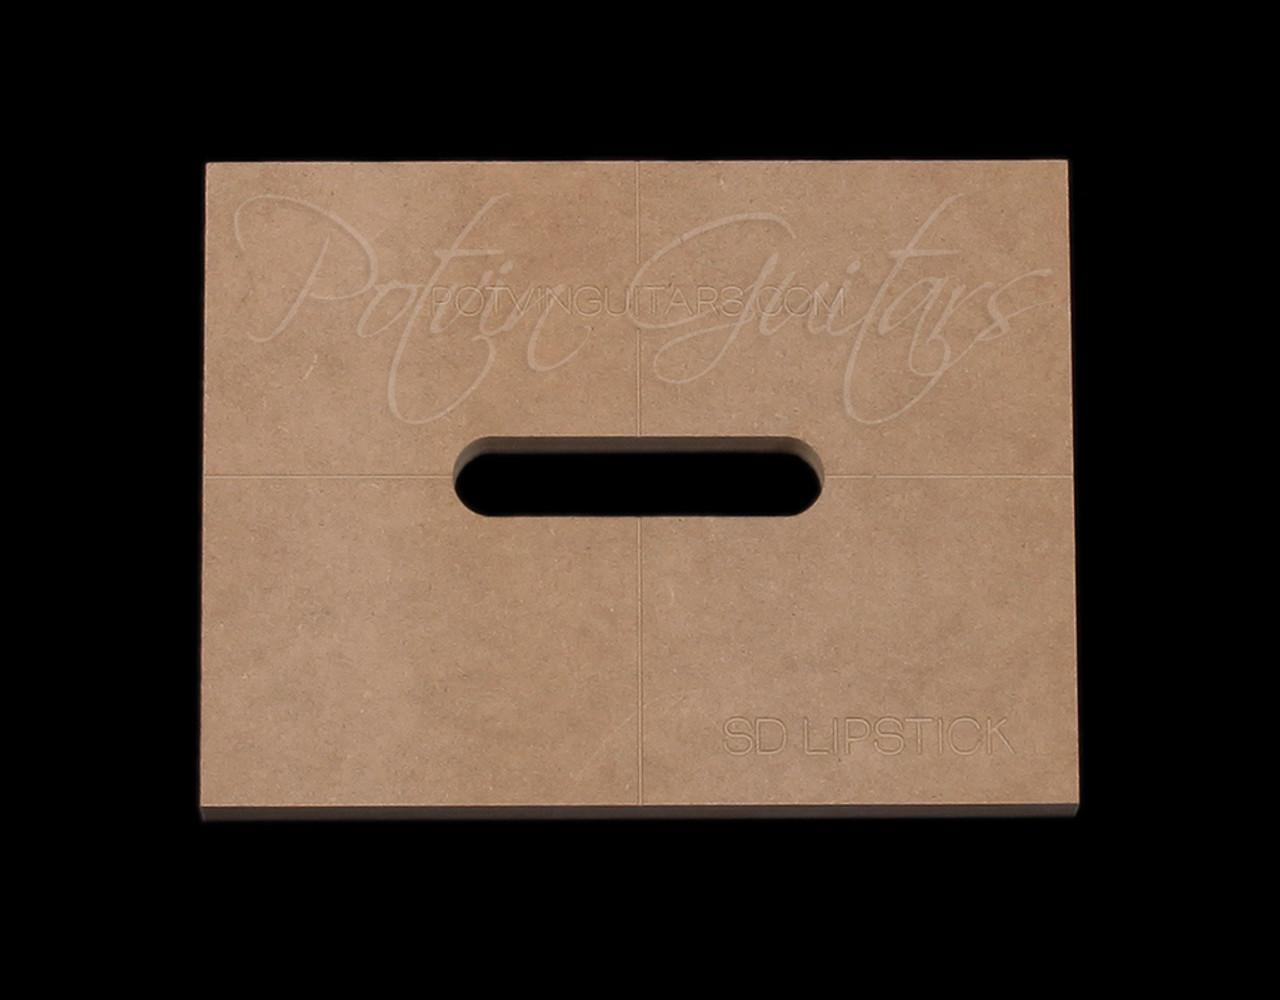 Seymour Duncan Danelectro Lipstick Pickup Template